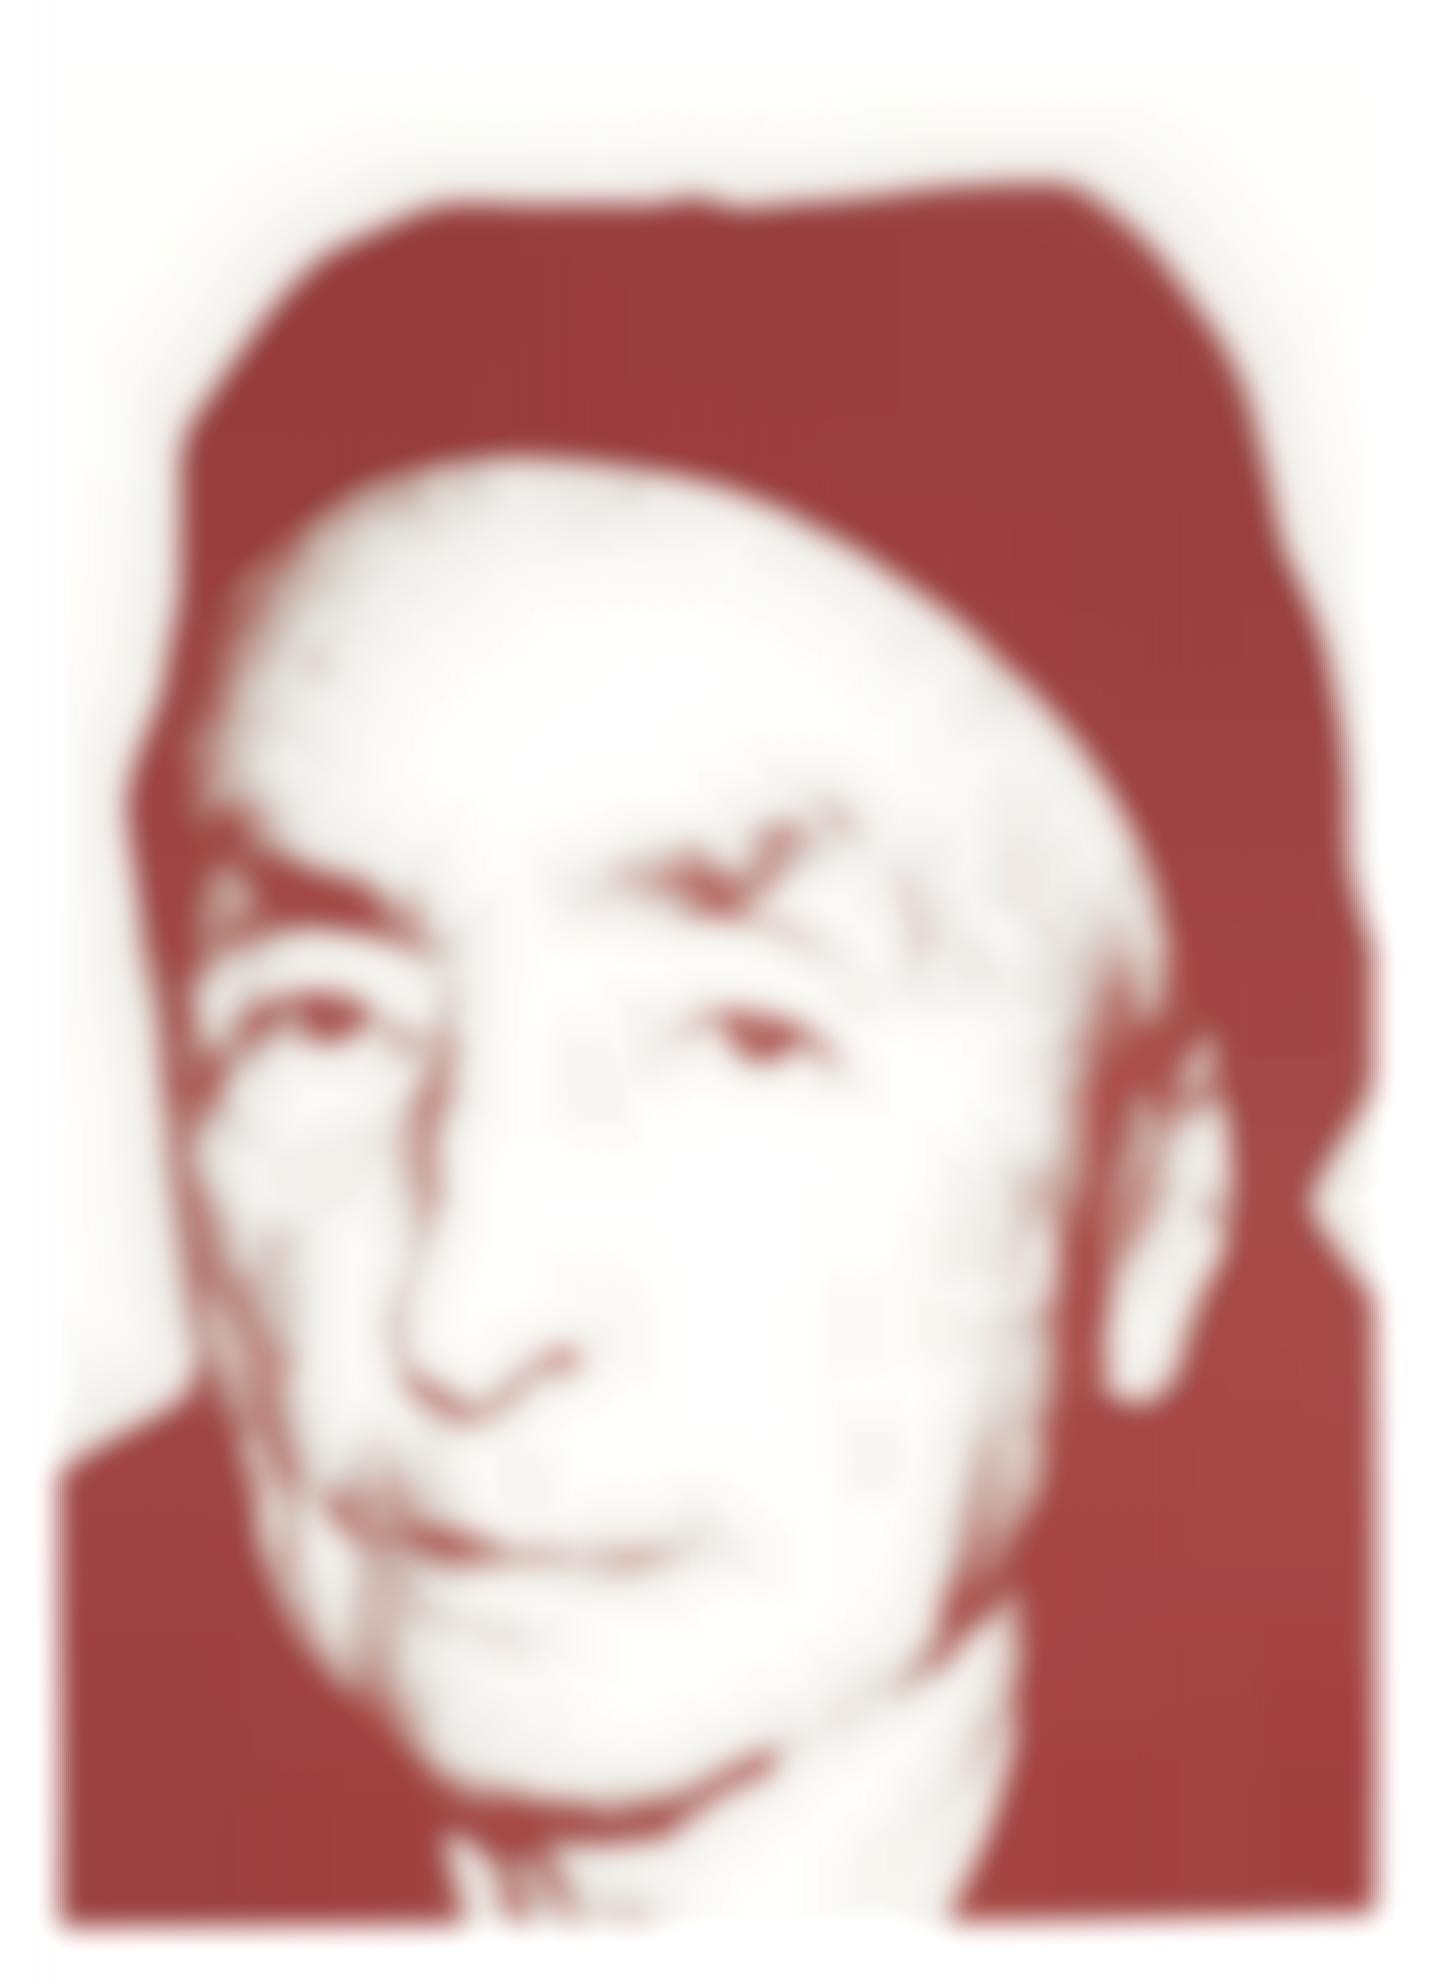 Andy Warhol-Georgia O'Keeffe-1979